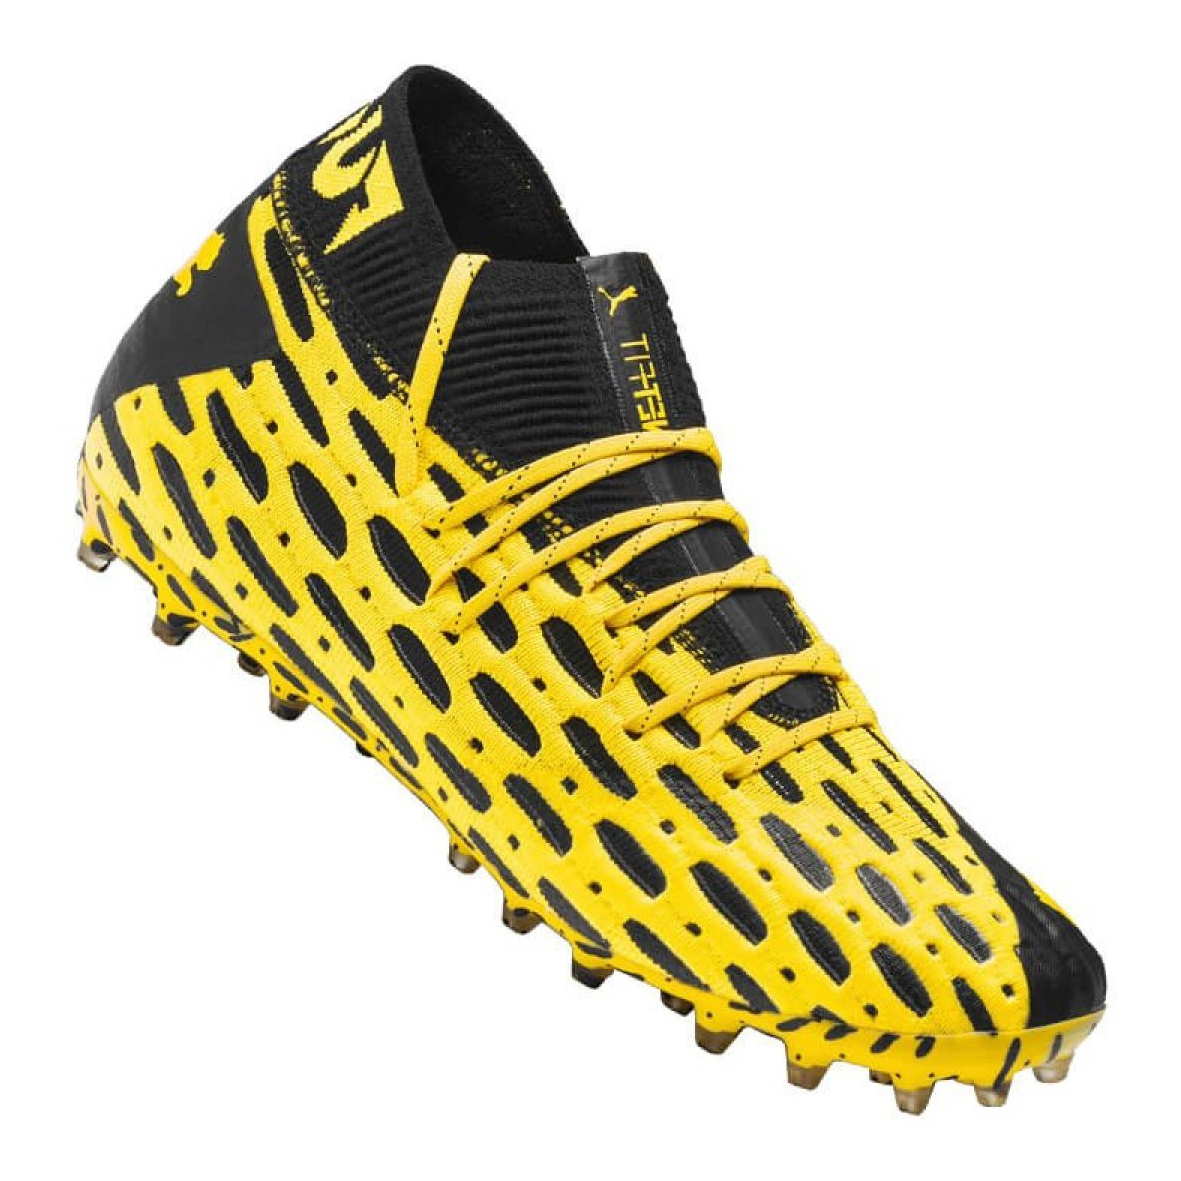 Puma Future 5.1 Netfit Mg M 105790-03 shoes multicolored yellow